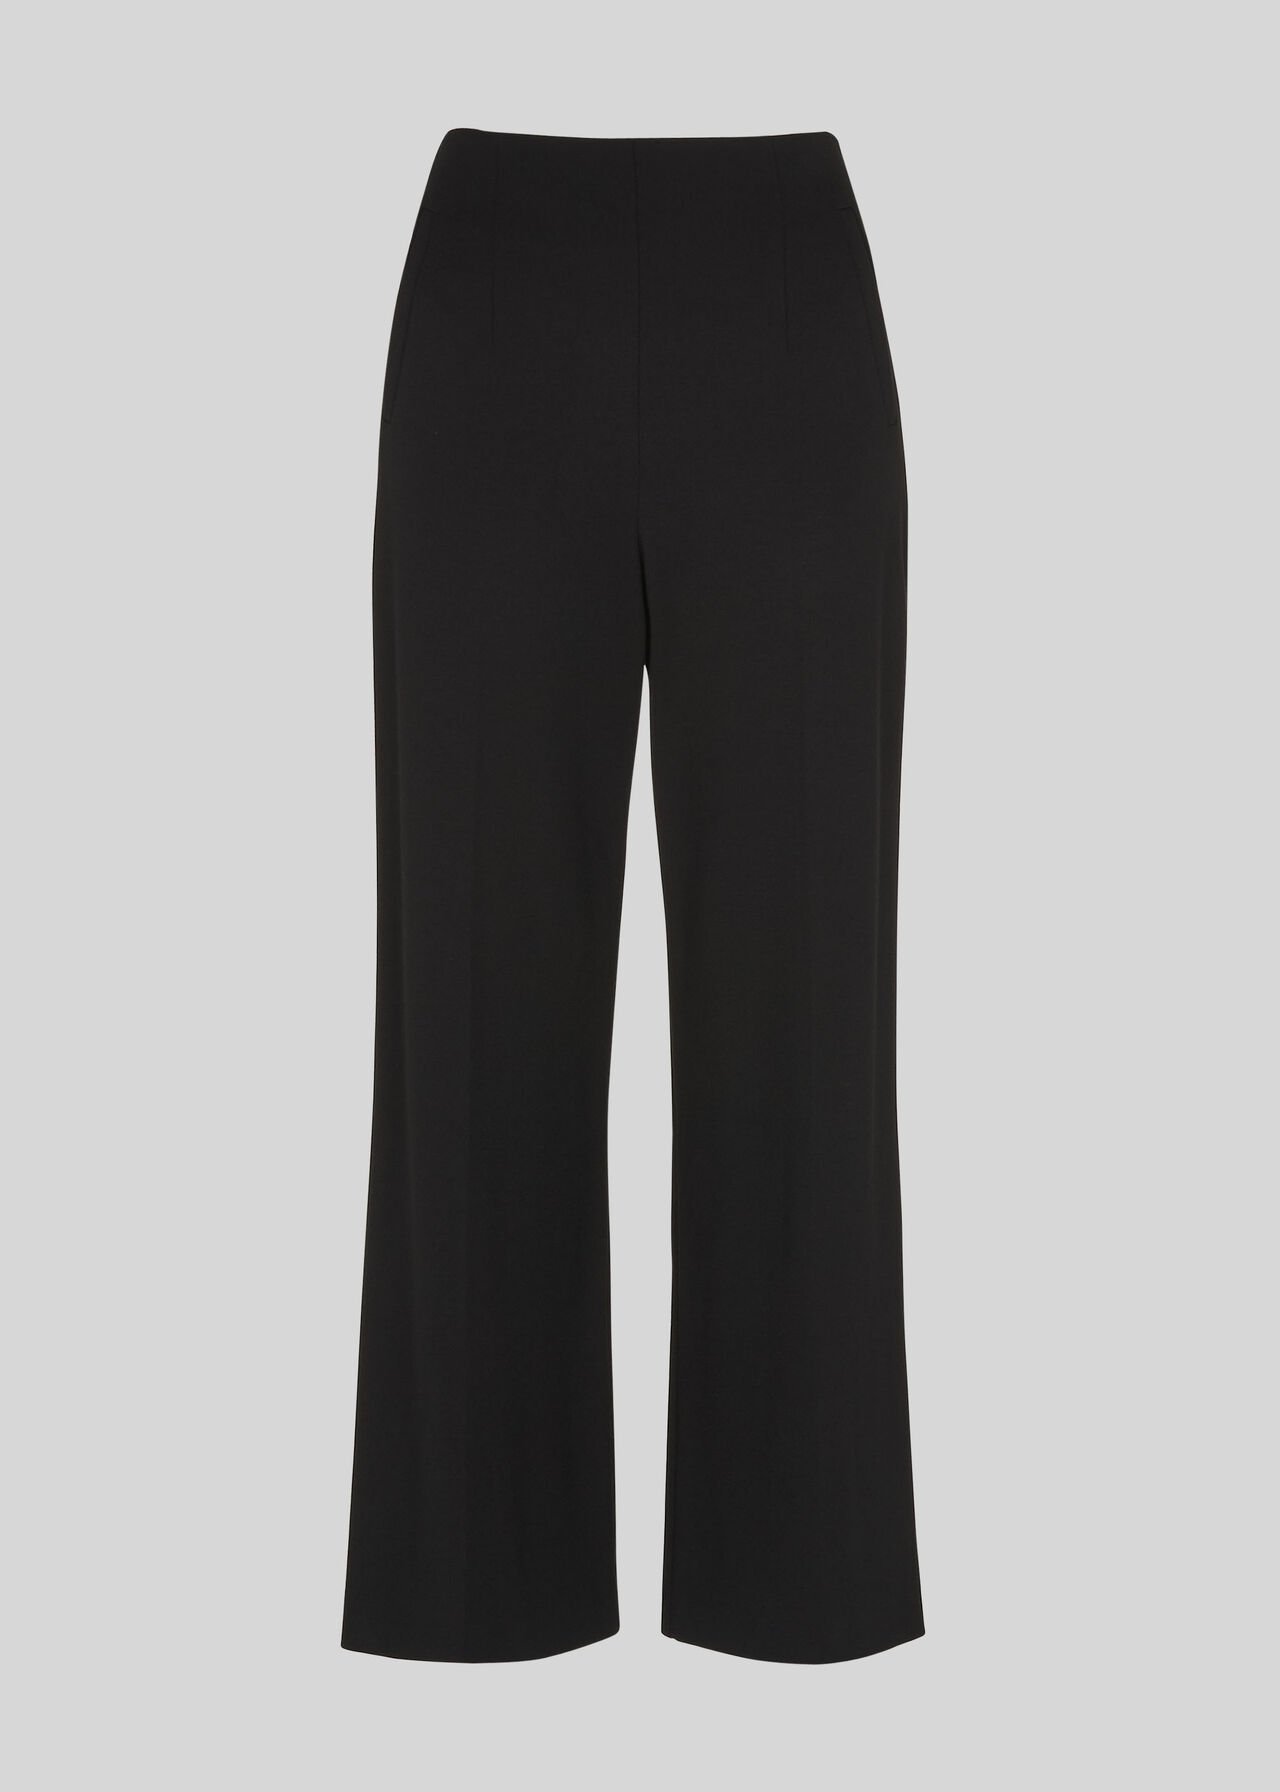 Flat Front Ponte Trouser Black